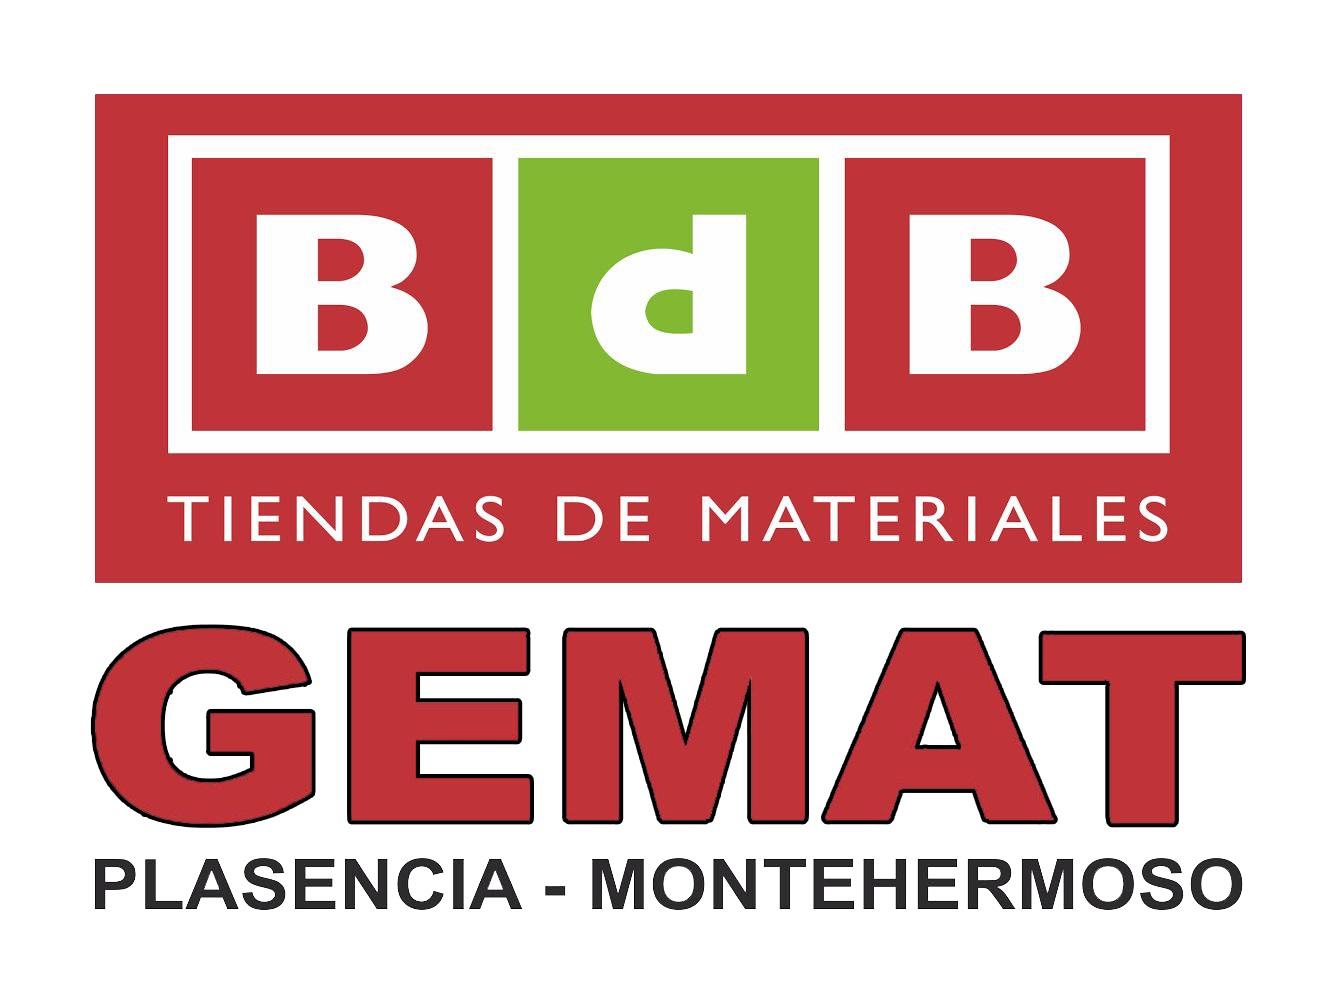 General de Materiales